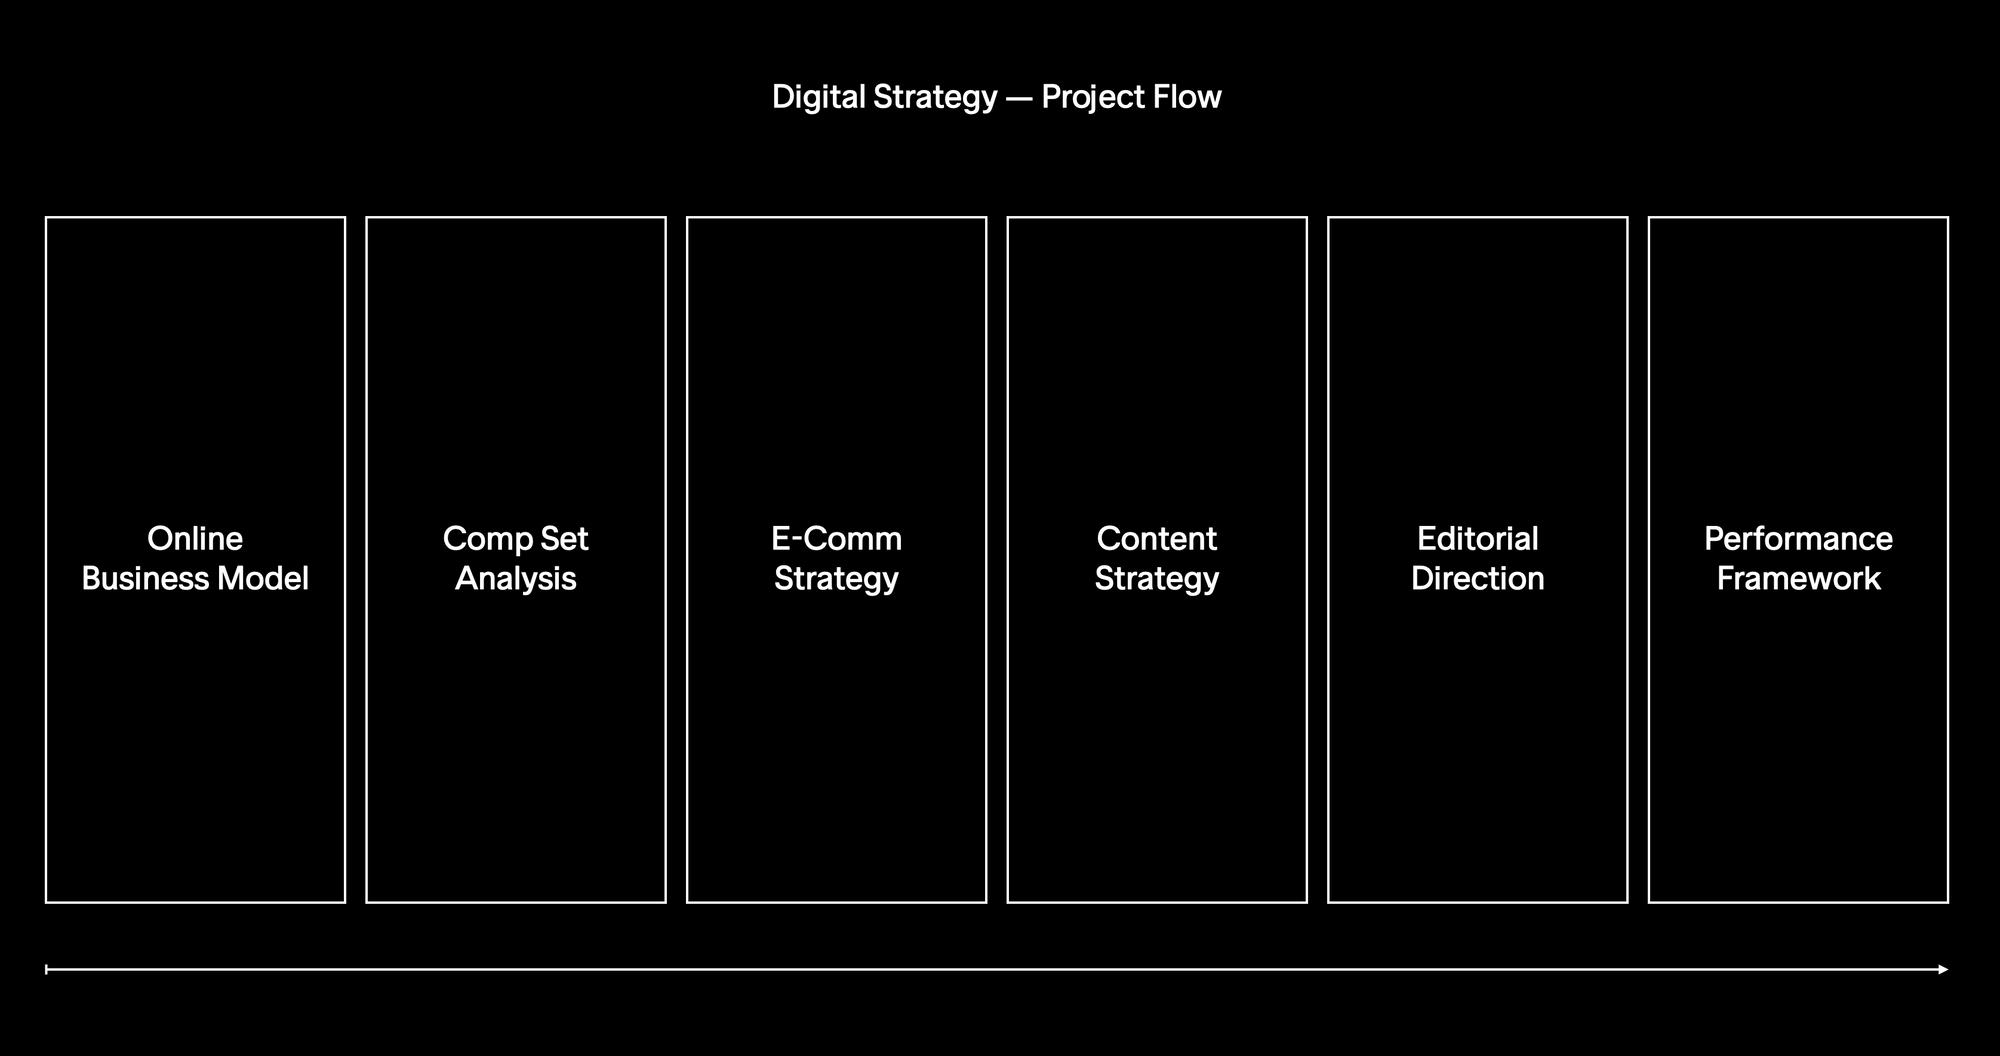 David Zwirner Digital Strategy Project Flow